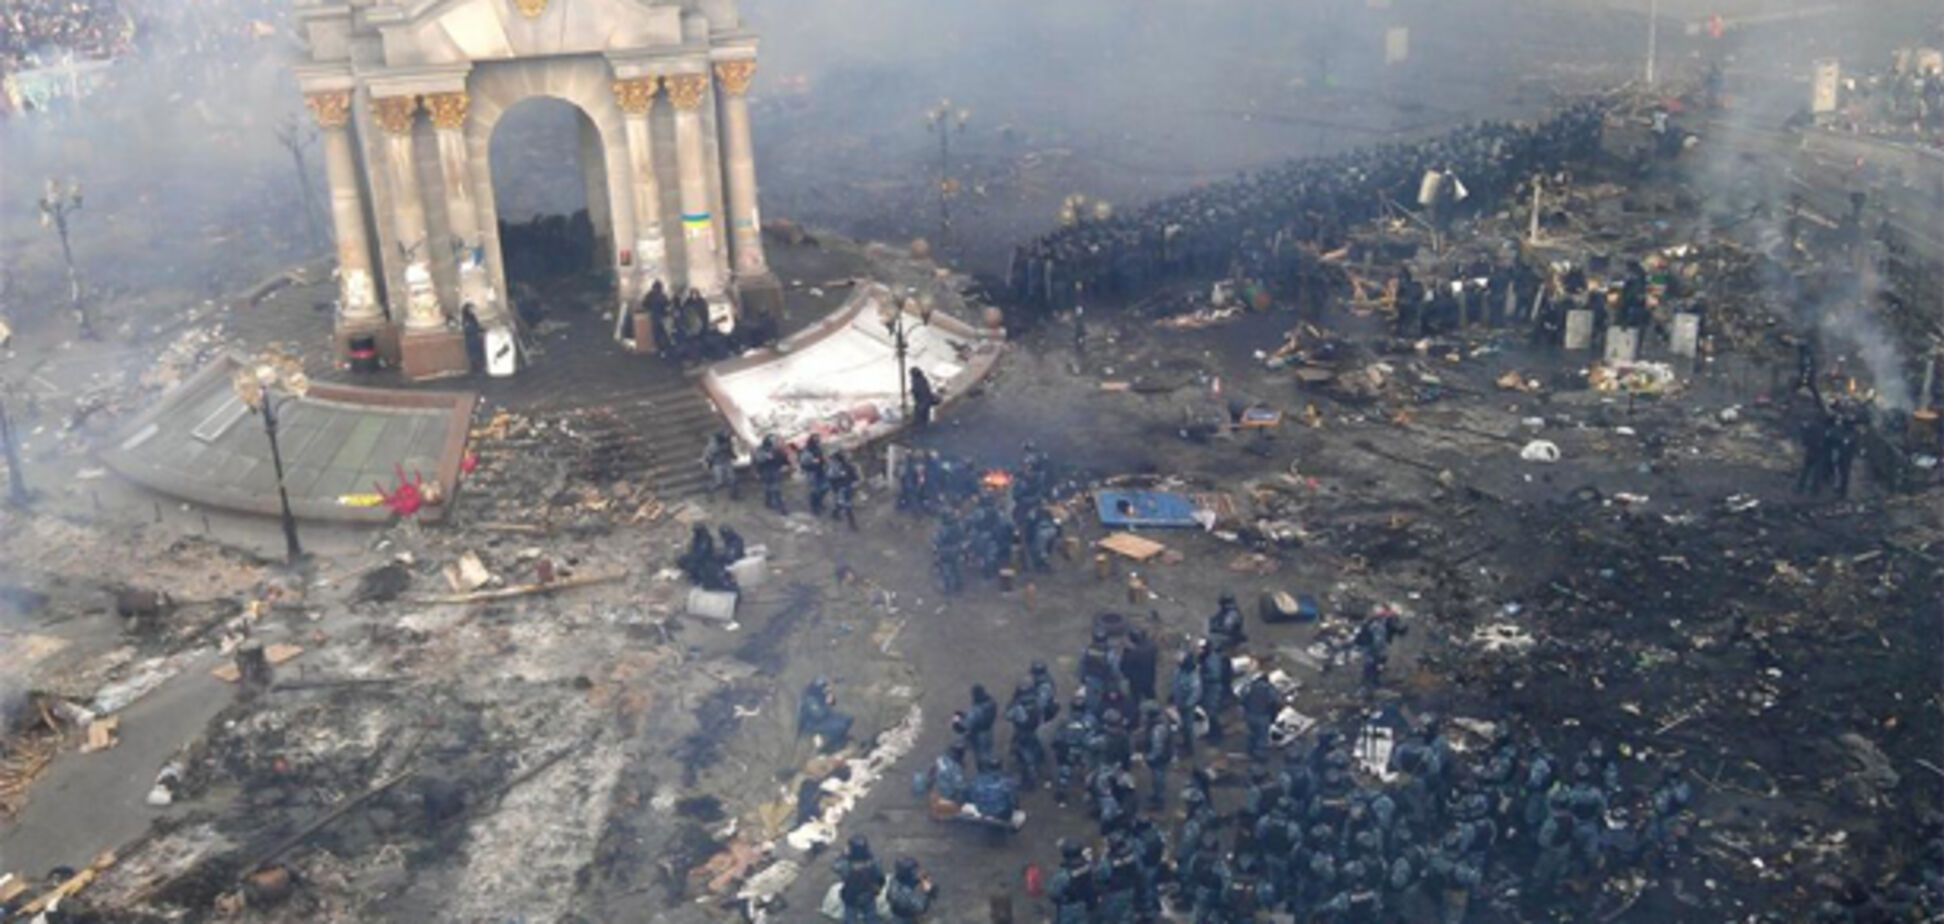 'Майдан хотели взорвать': экс-охранник Януковича заявил о 'теракте'